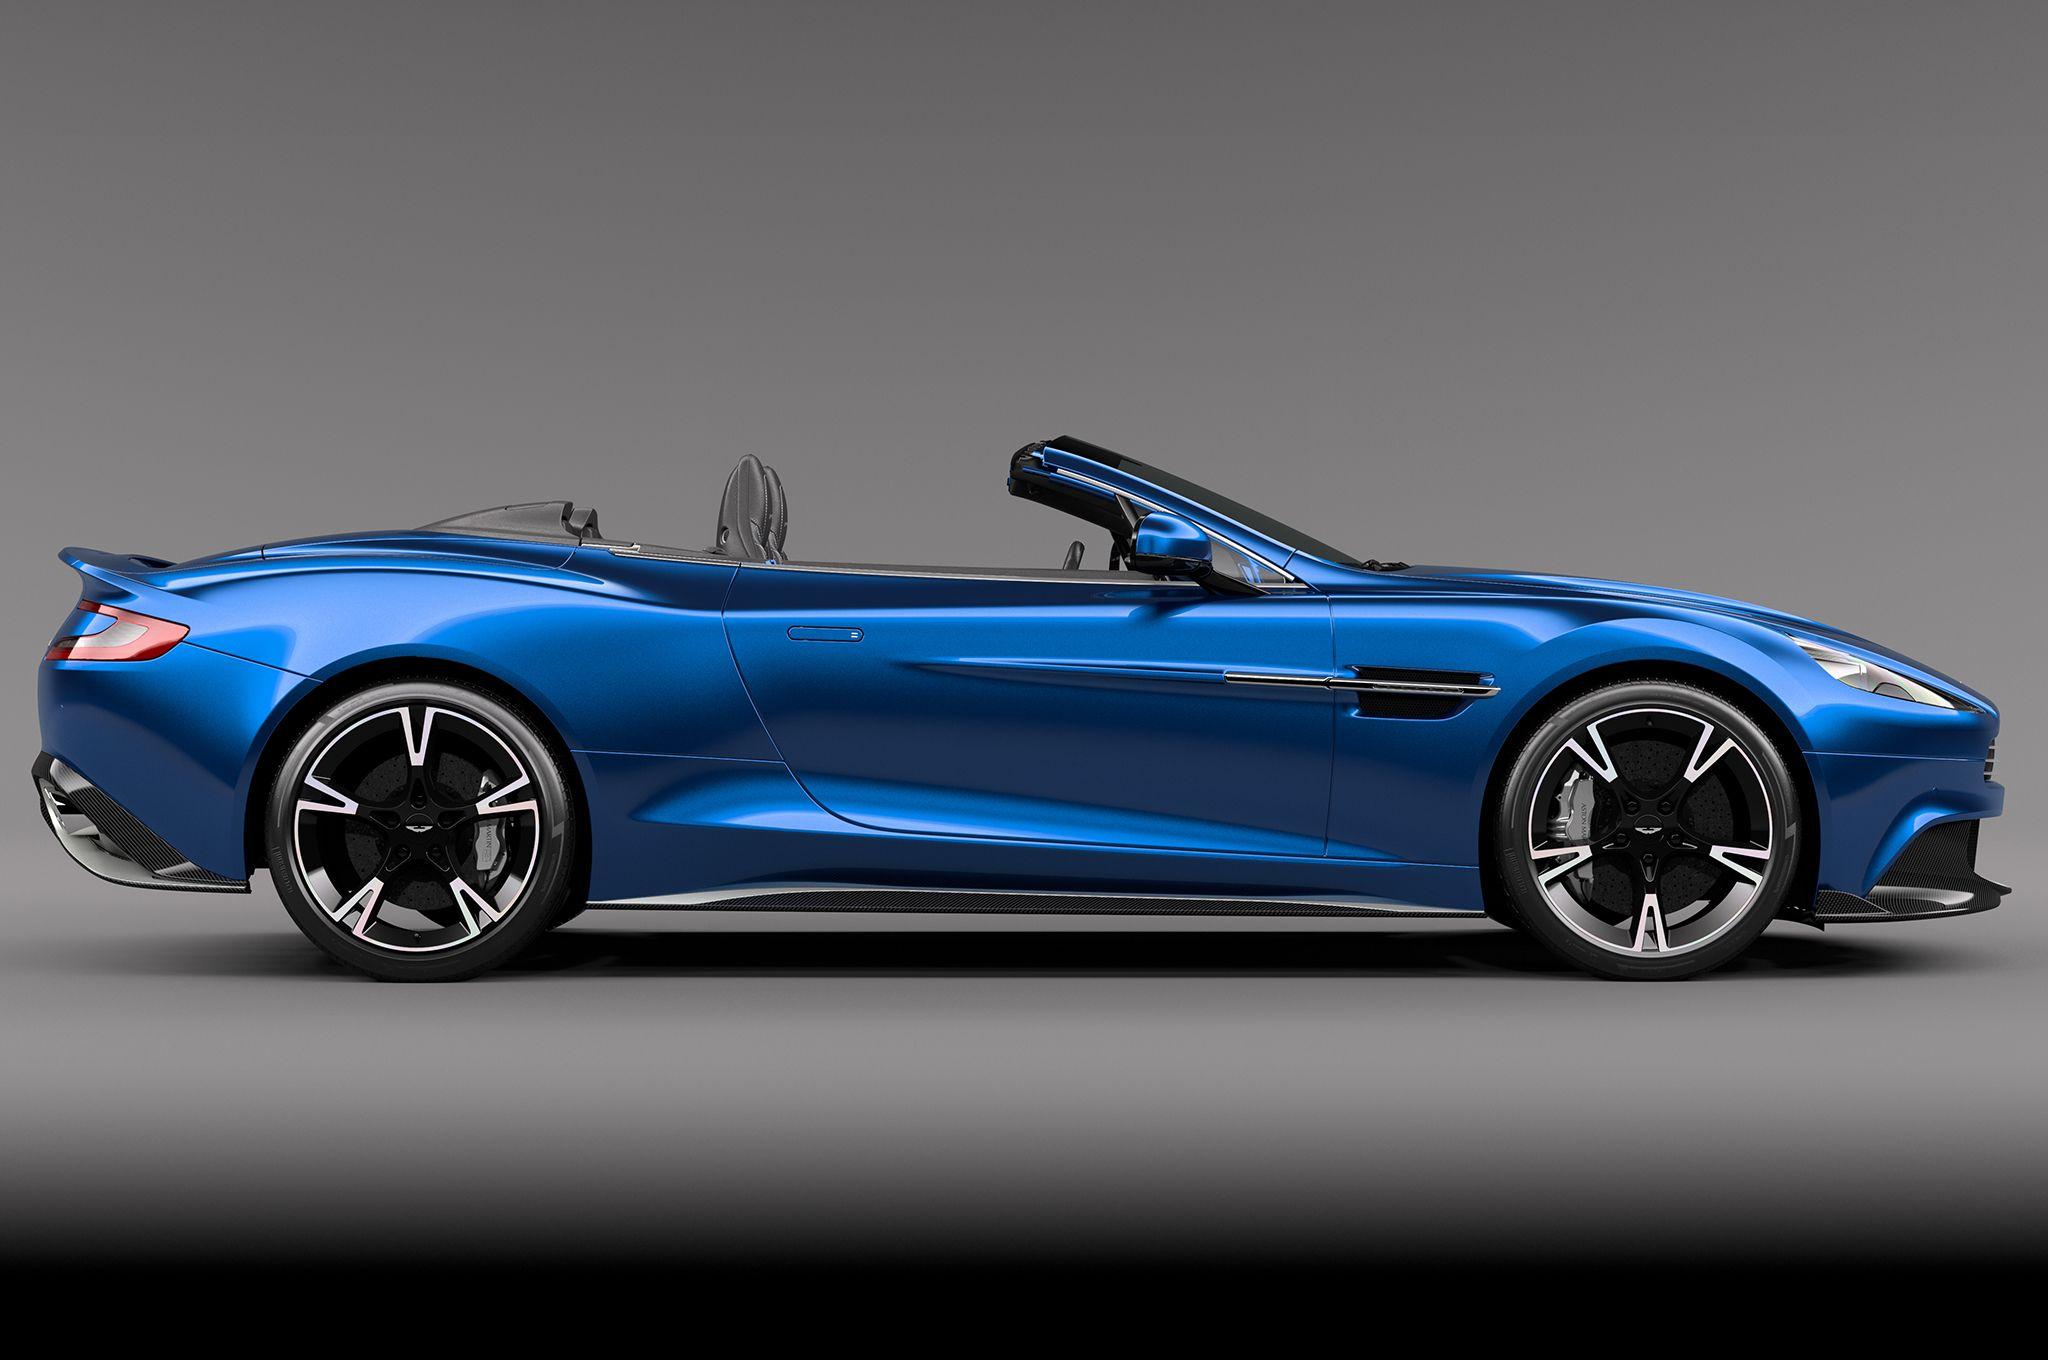 Aston Martin Vanquish S Vanquish Volante Side Profile